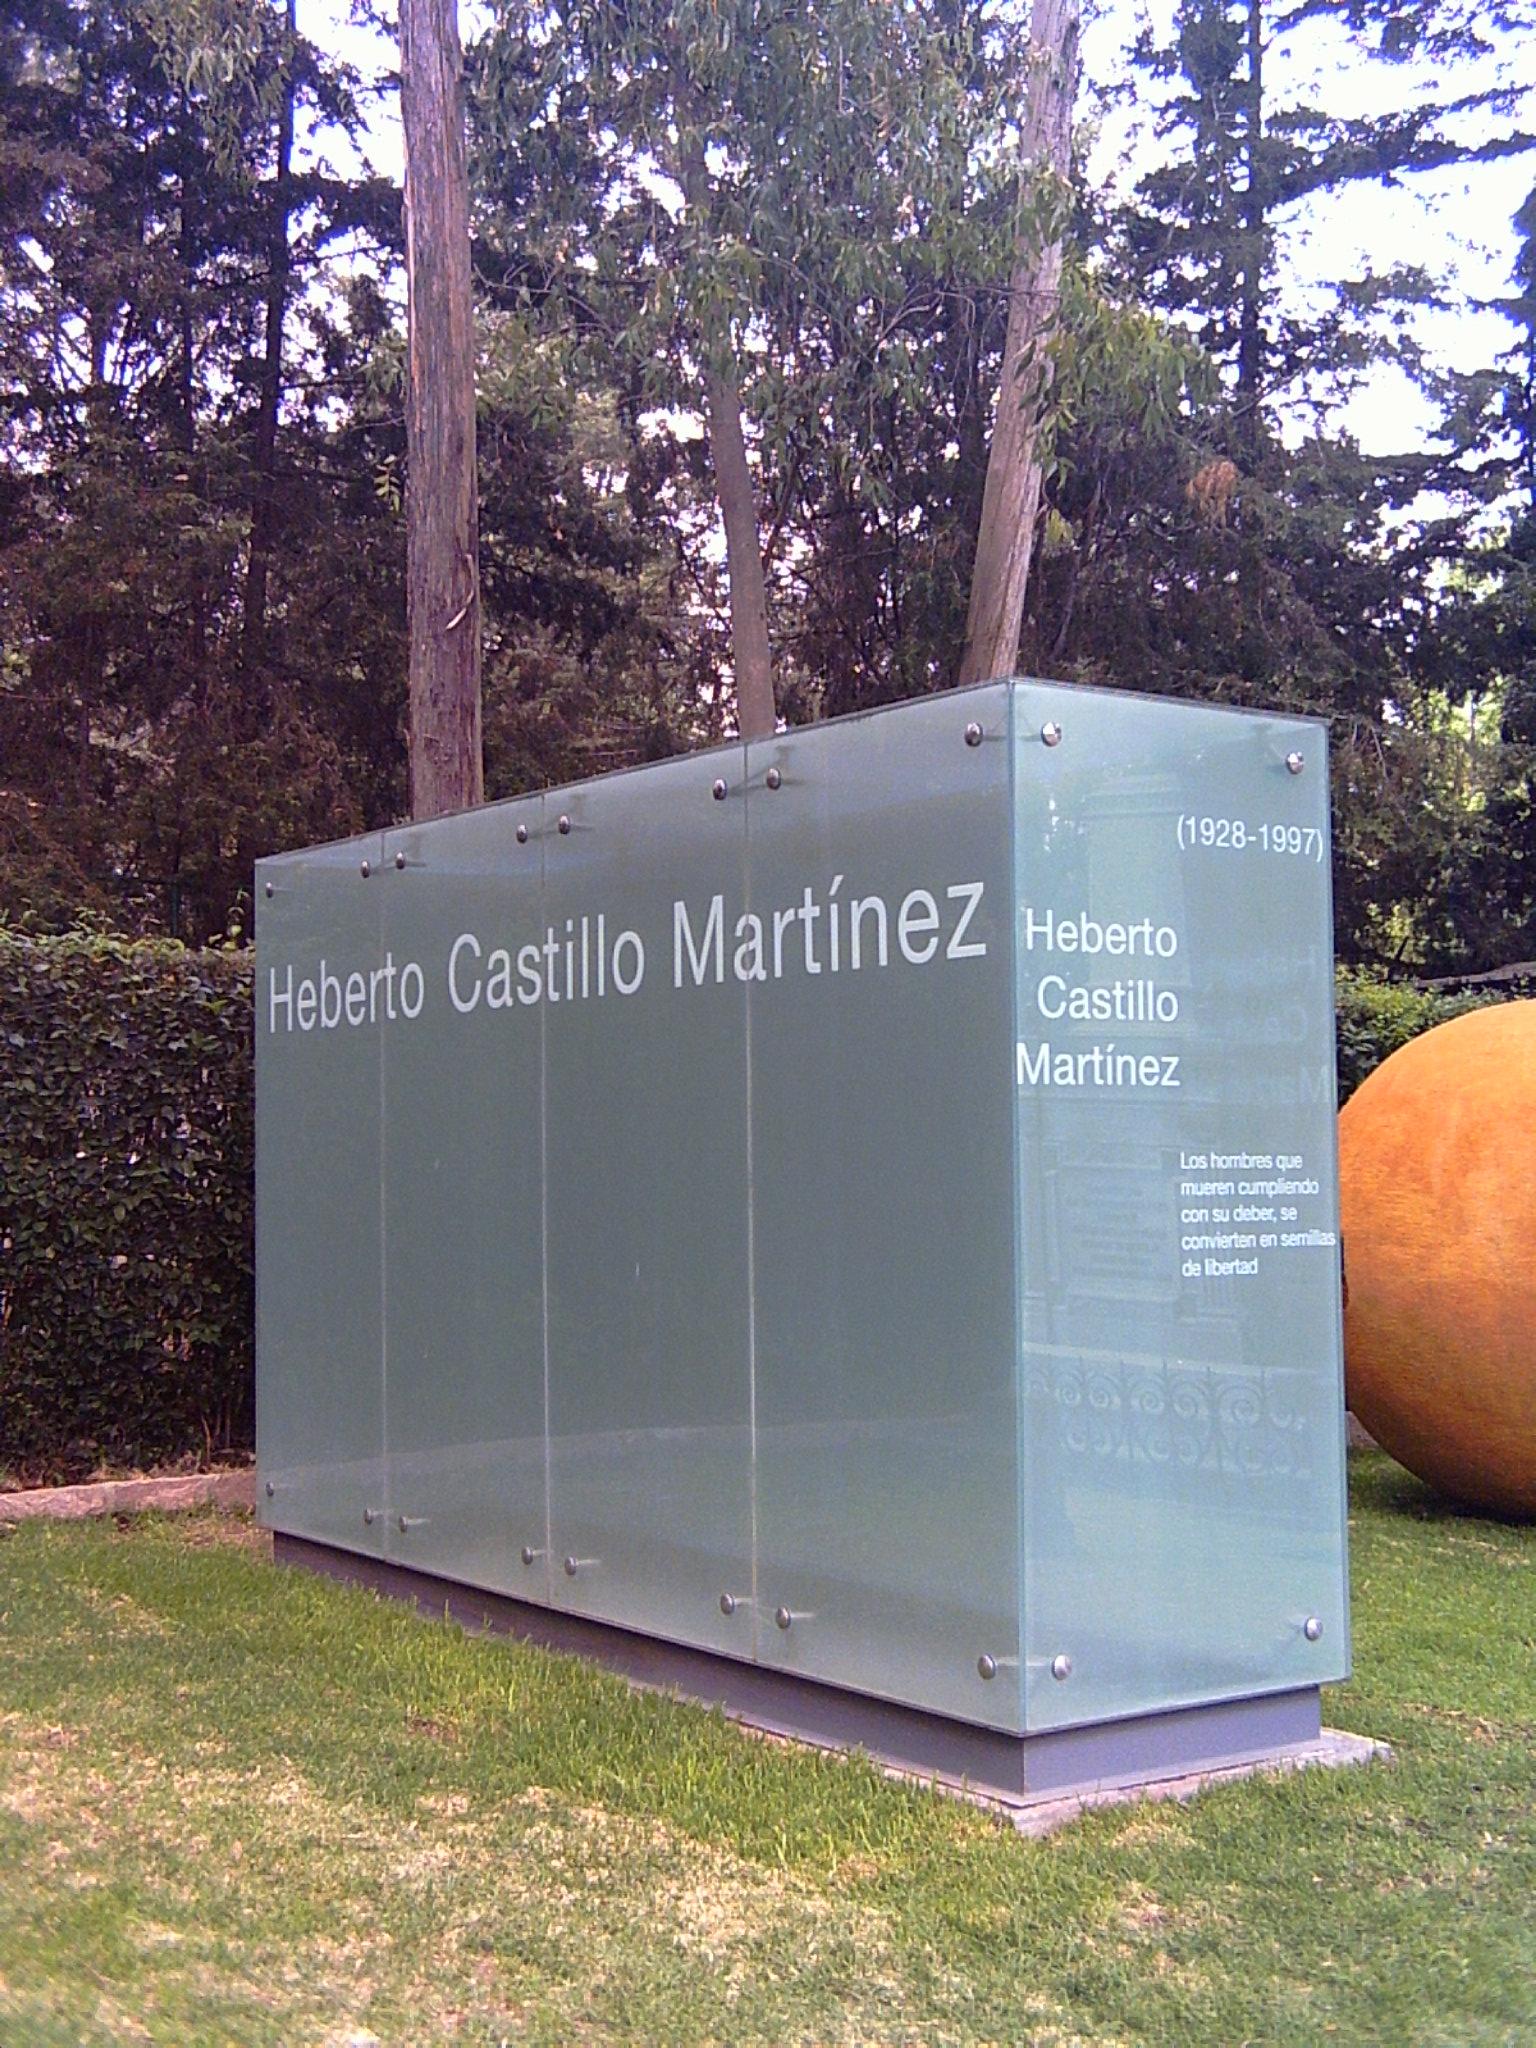 Monumento Funerario a Heberto Castillo  - Ciudad de México